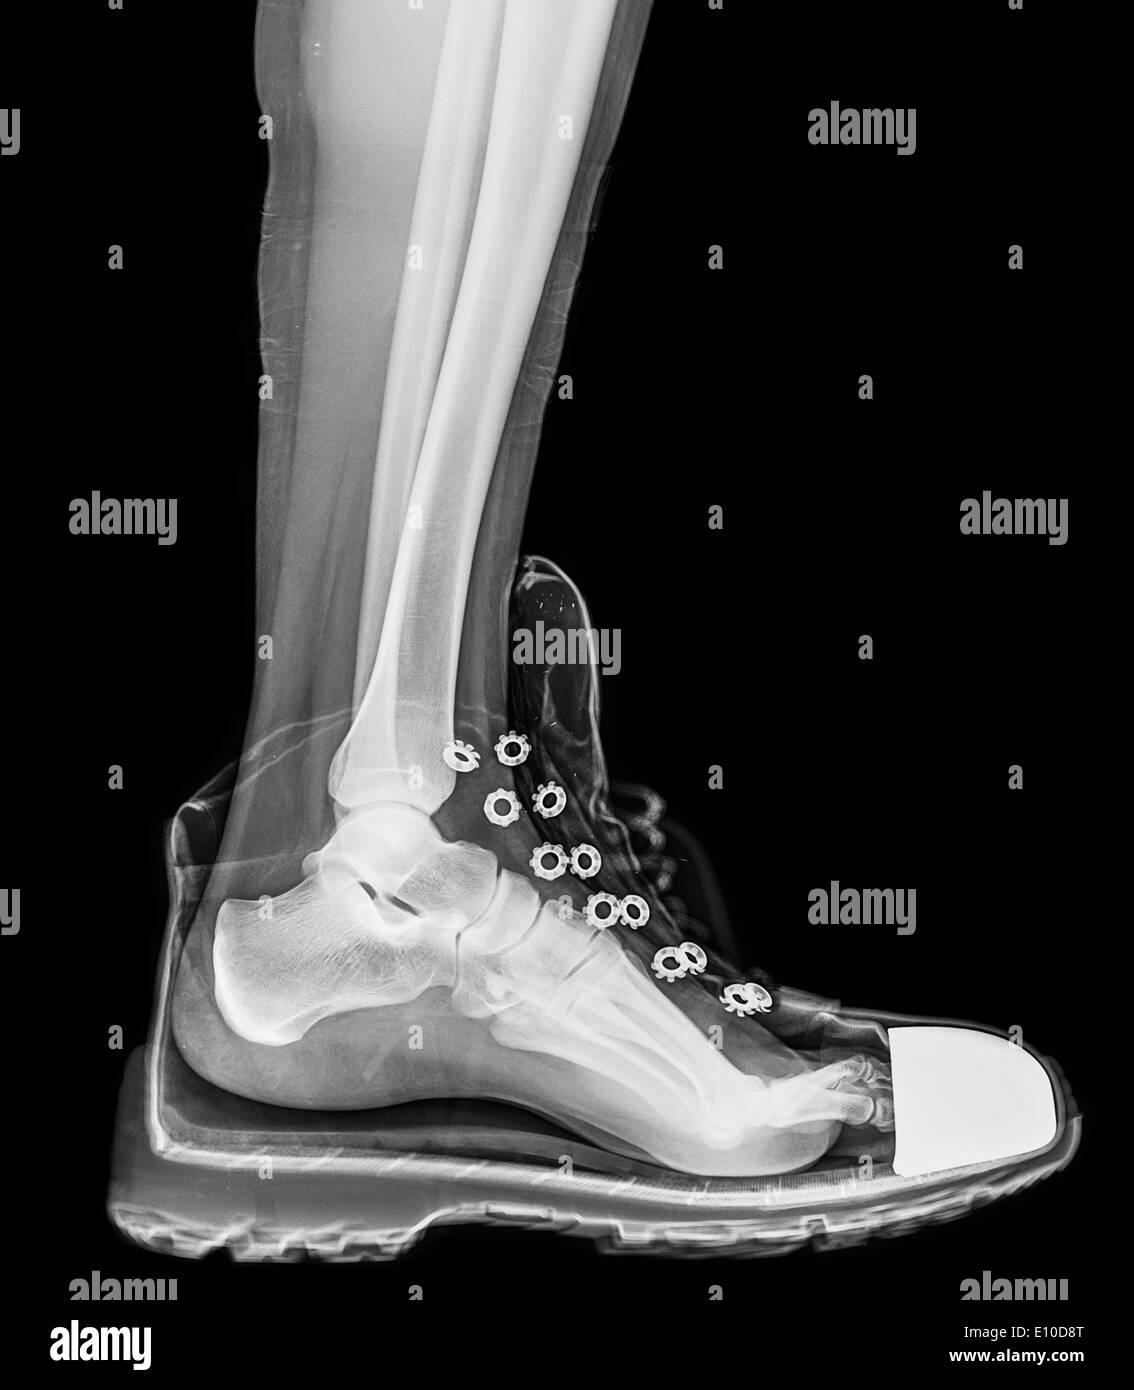 Running Shoe Toe Covers